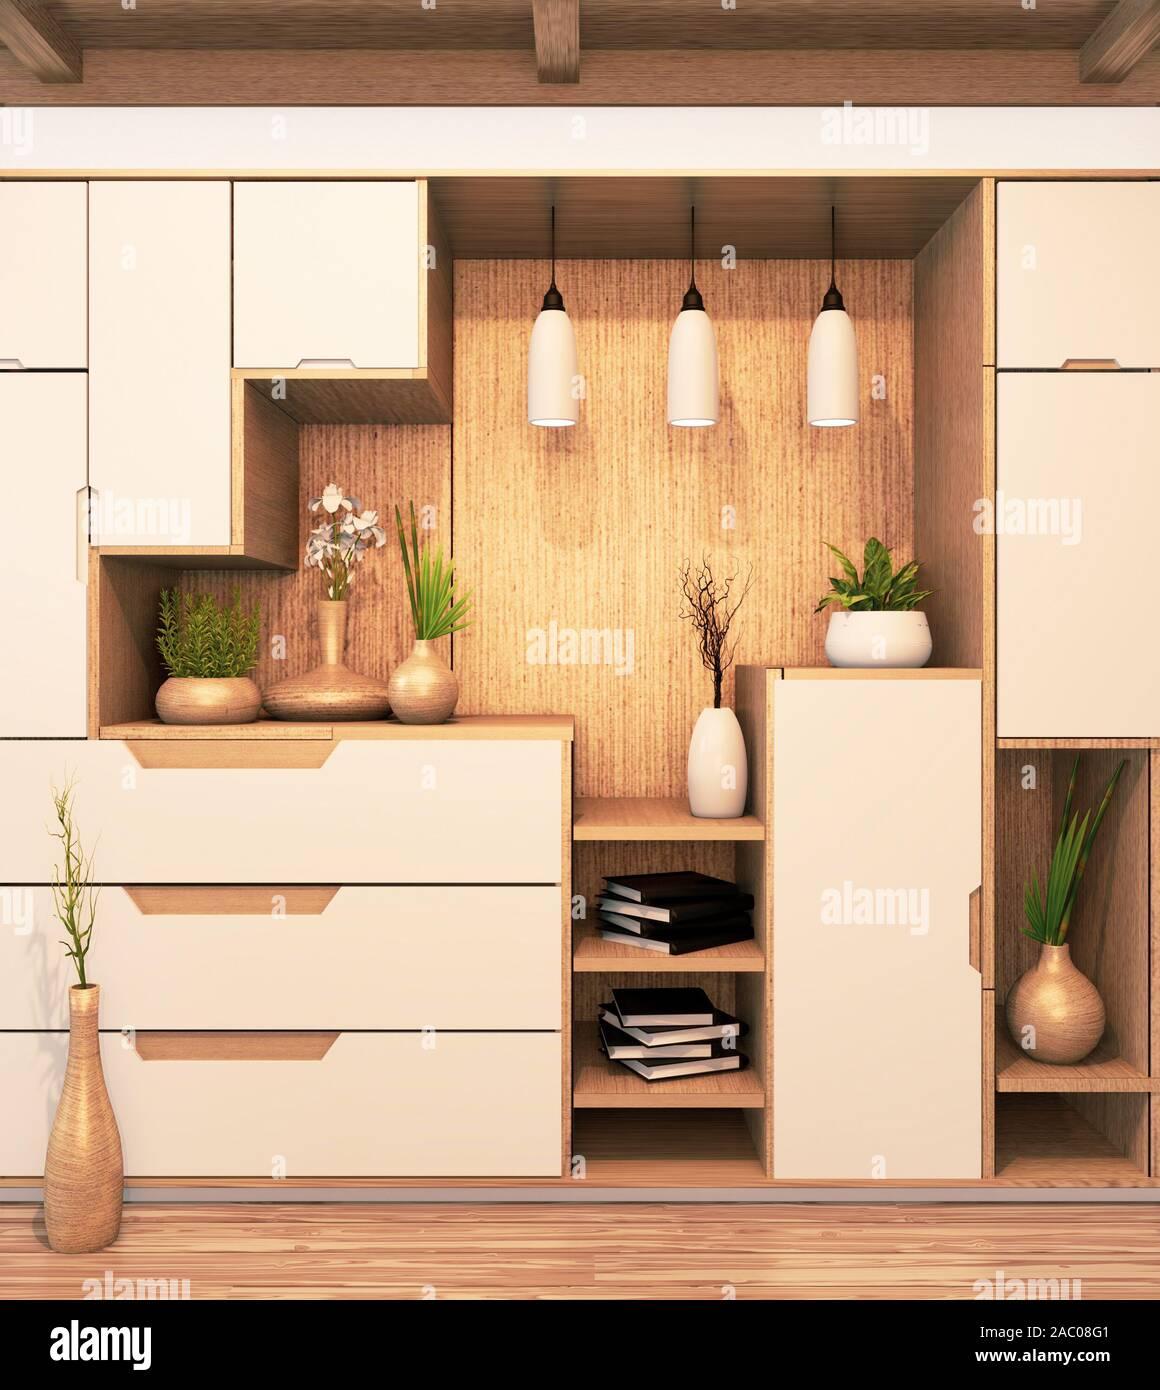 Design Cabinet Shelf Wooden Japanese Style On Empty Room